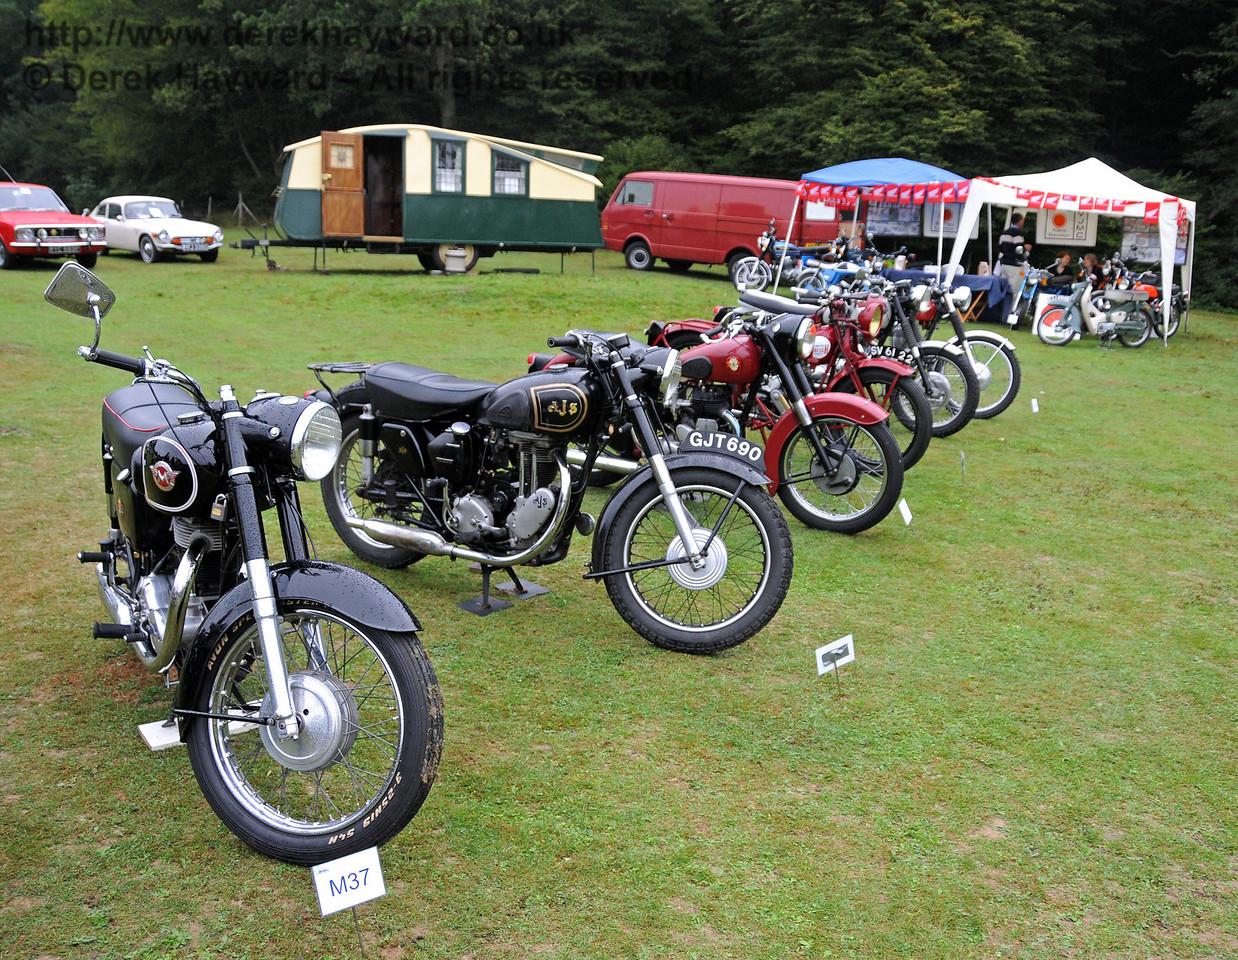 A further display of motorbikes. Horsted Keynes 21.08.2010  4130